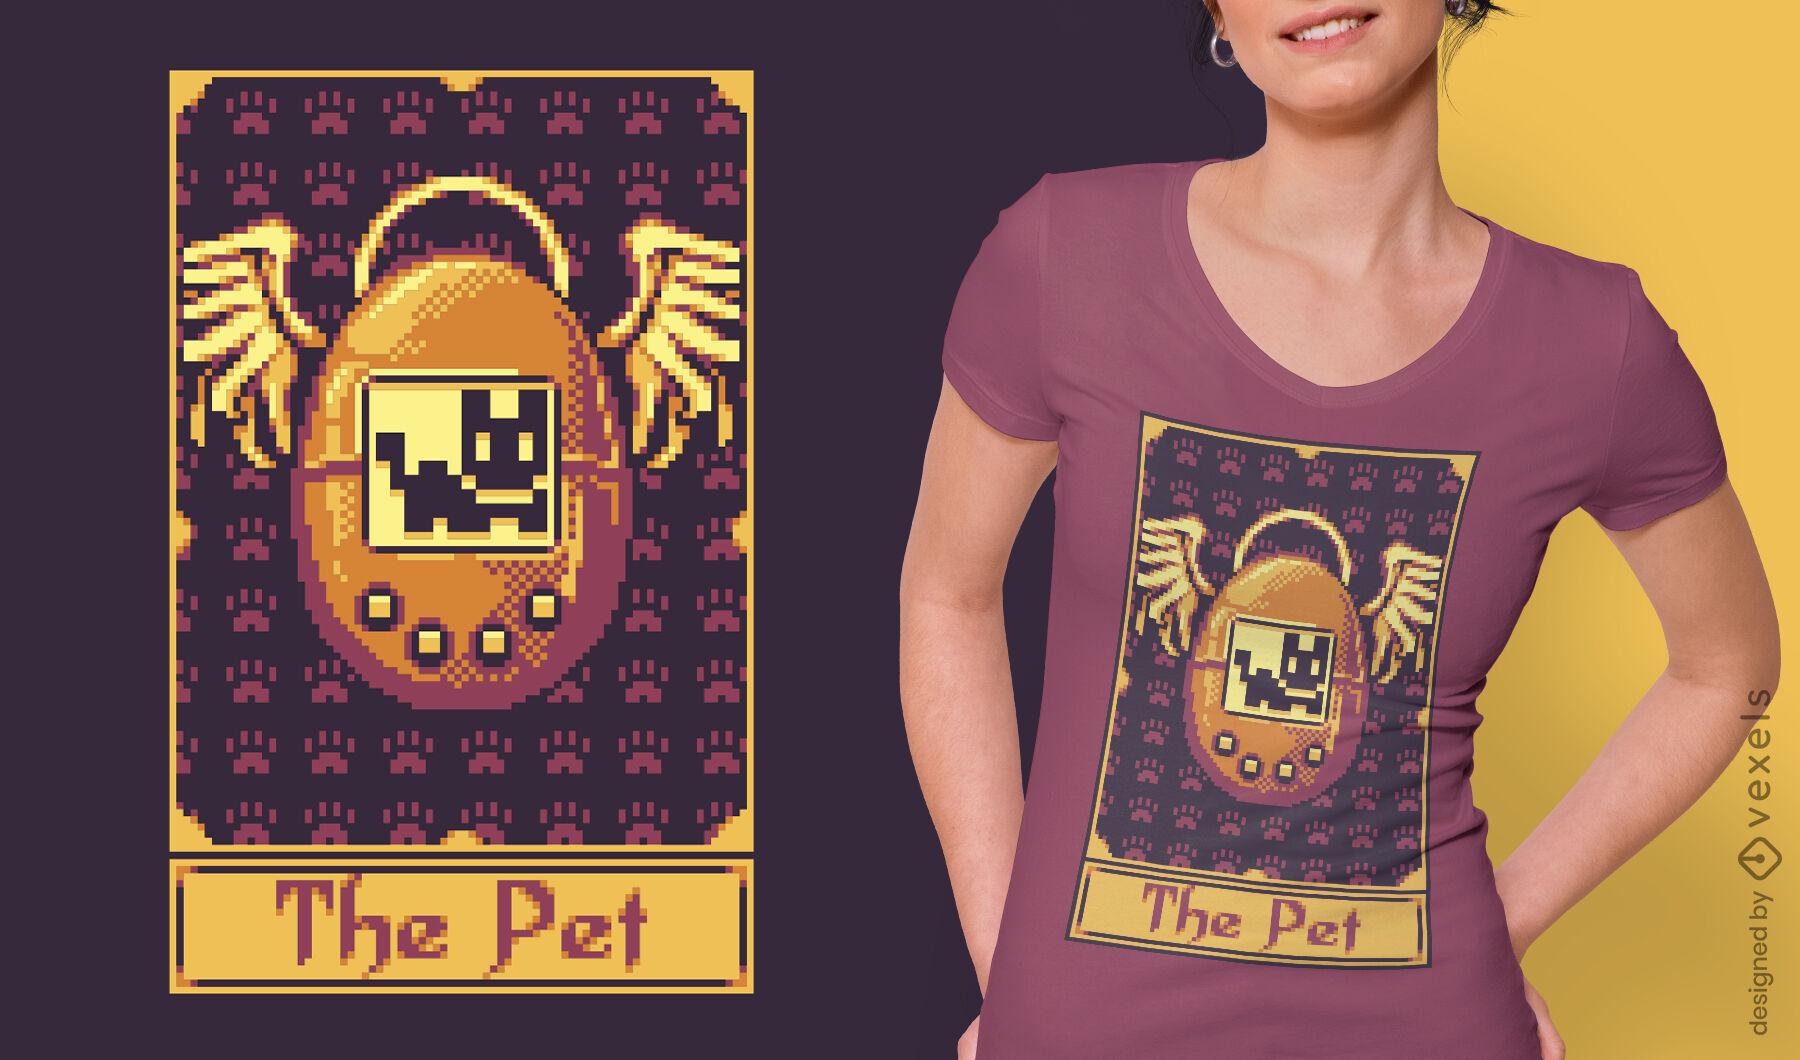 Pixel-Tarotkarten-Retro-Spiel-T-Shirt-Design